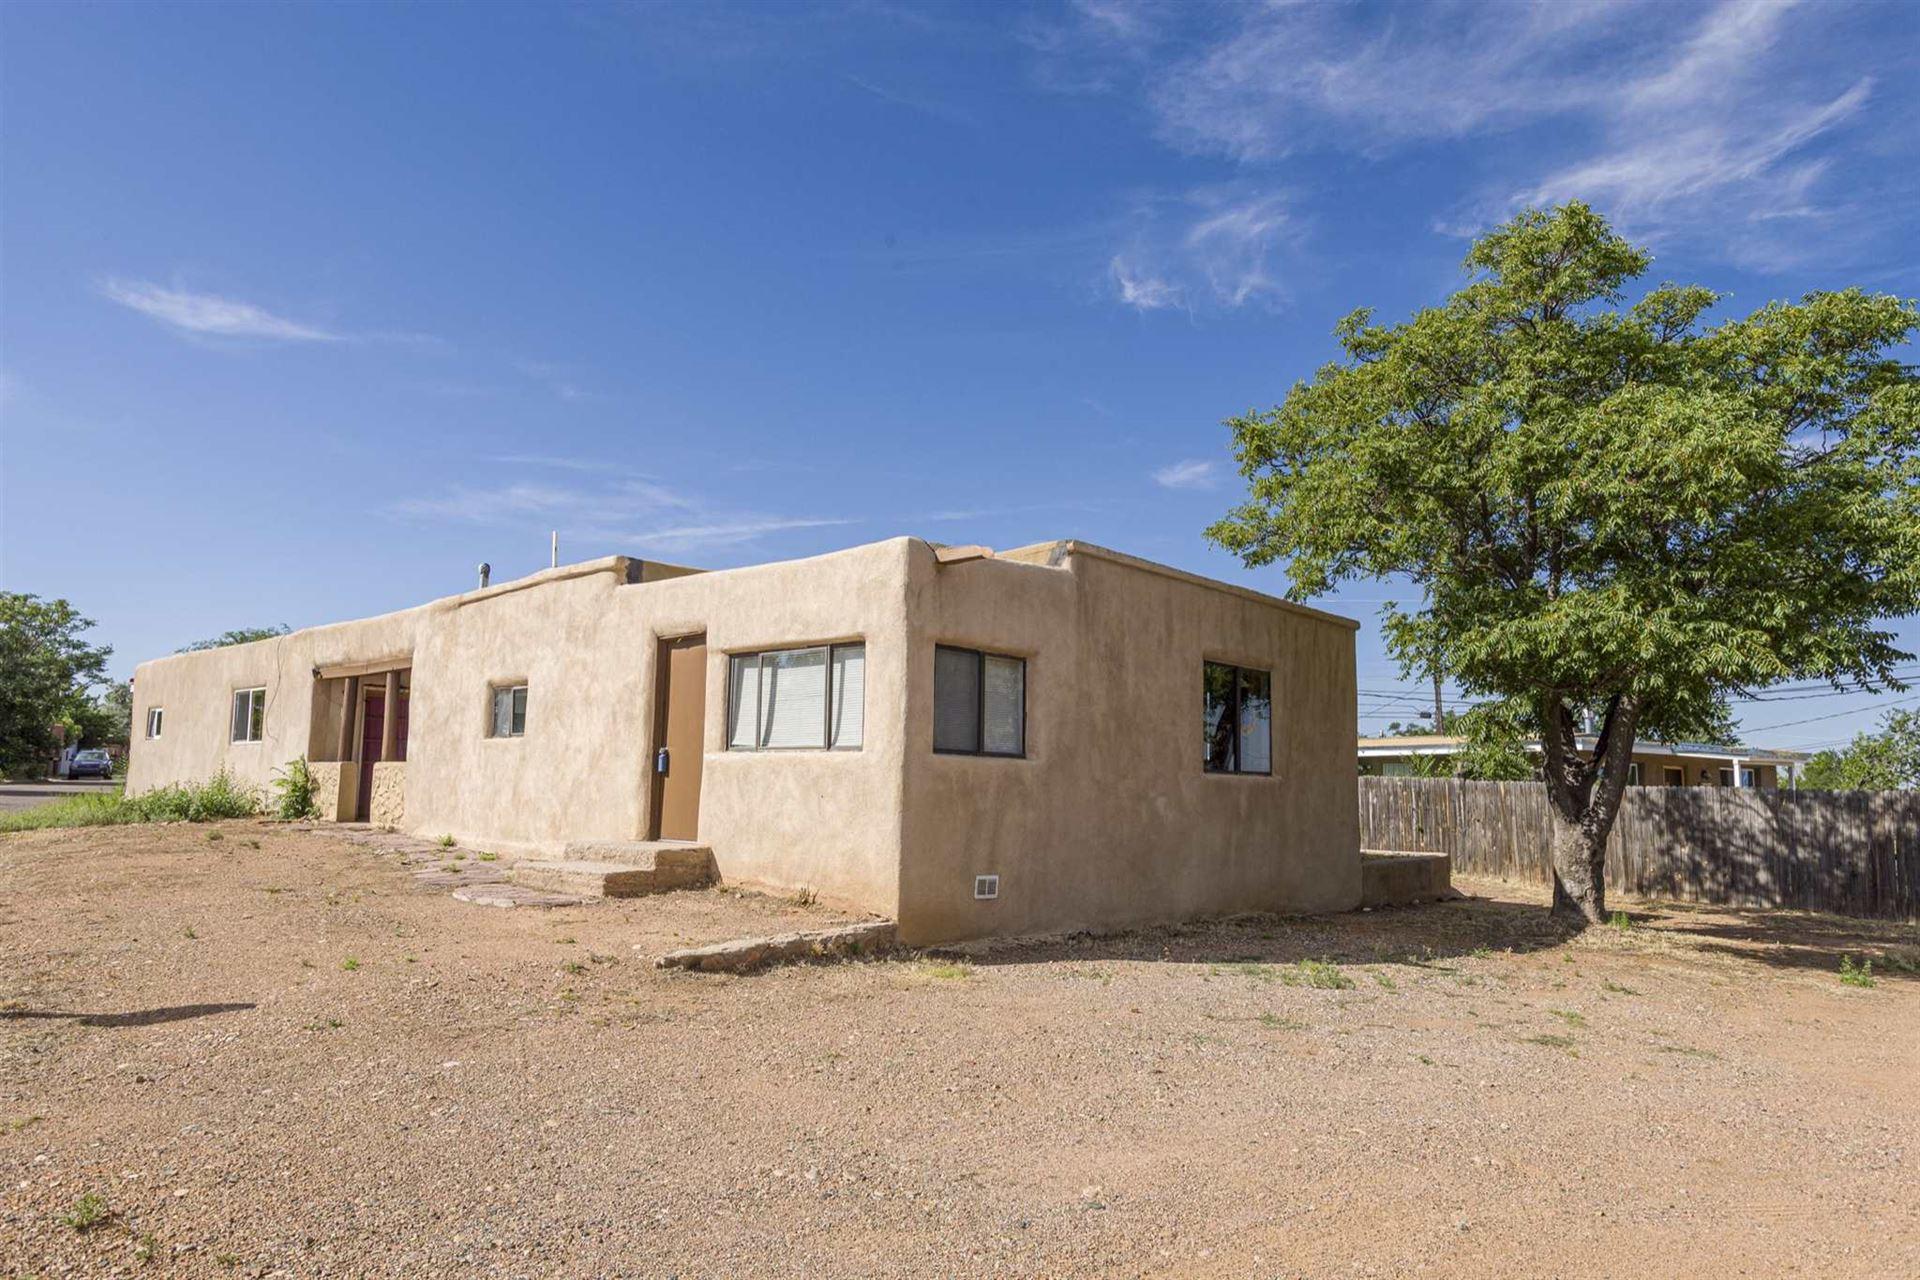 Photo for 504 Camino Solano, Santa Fe, NM 87505 (MLS # 201903551)